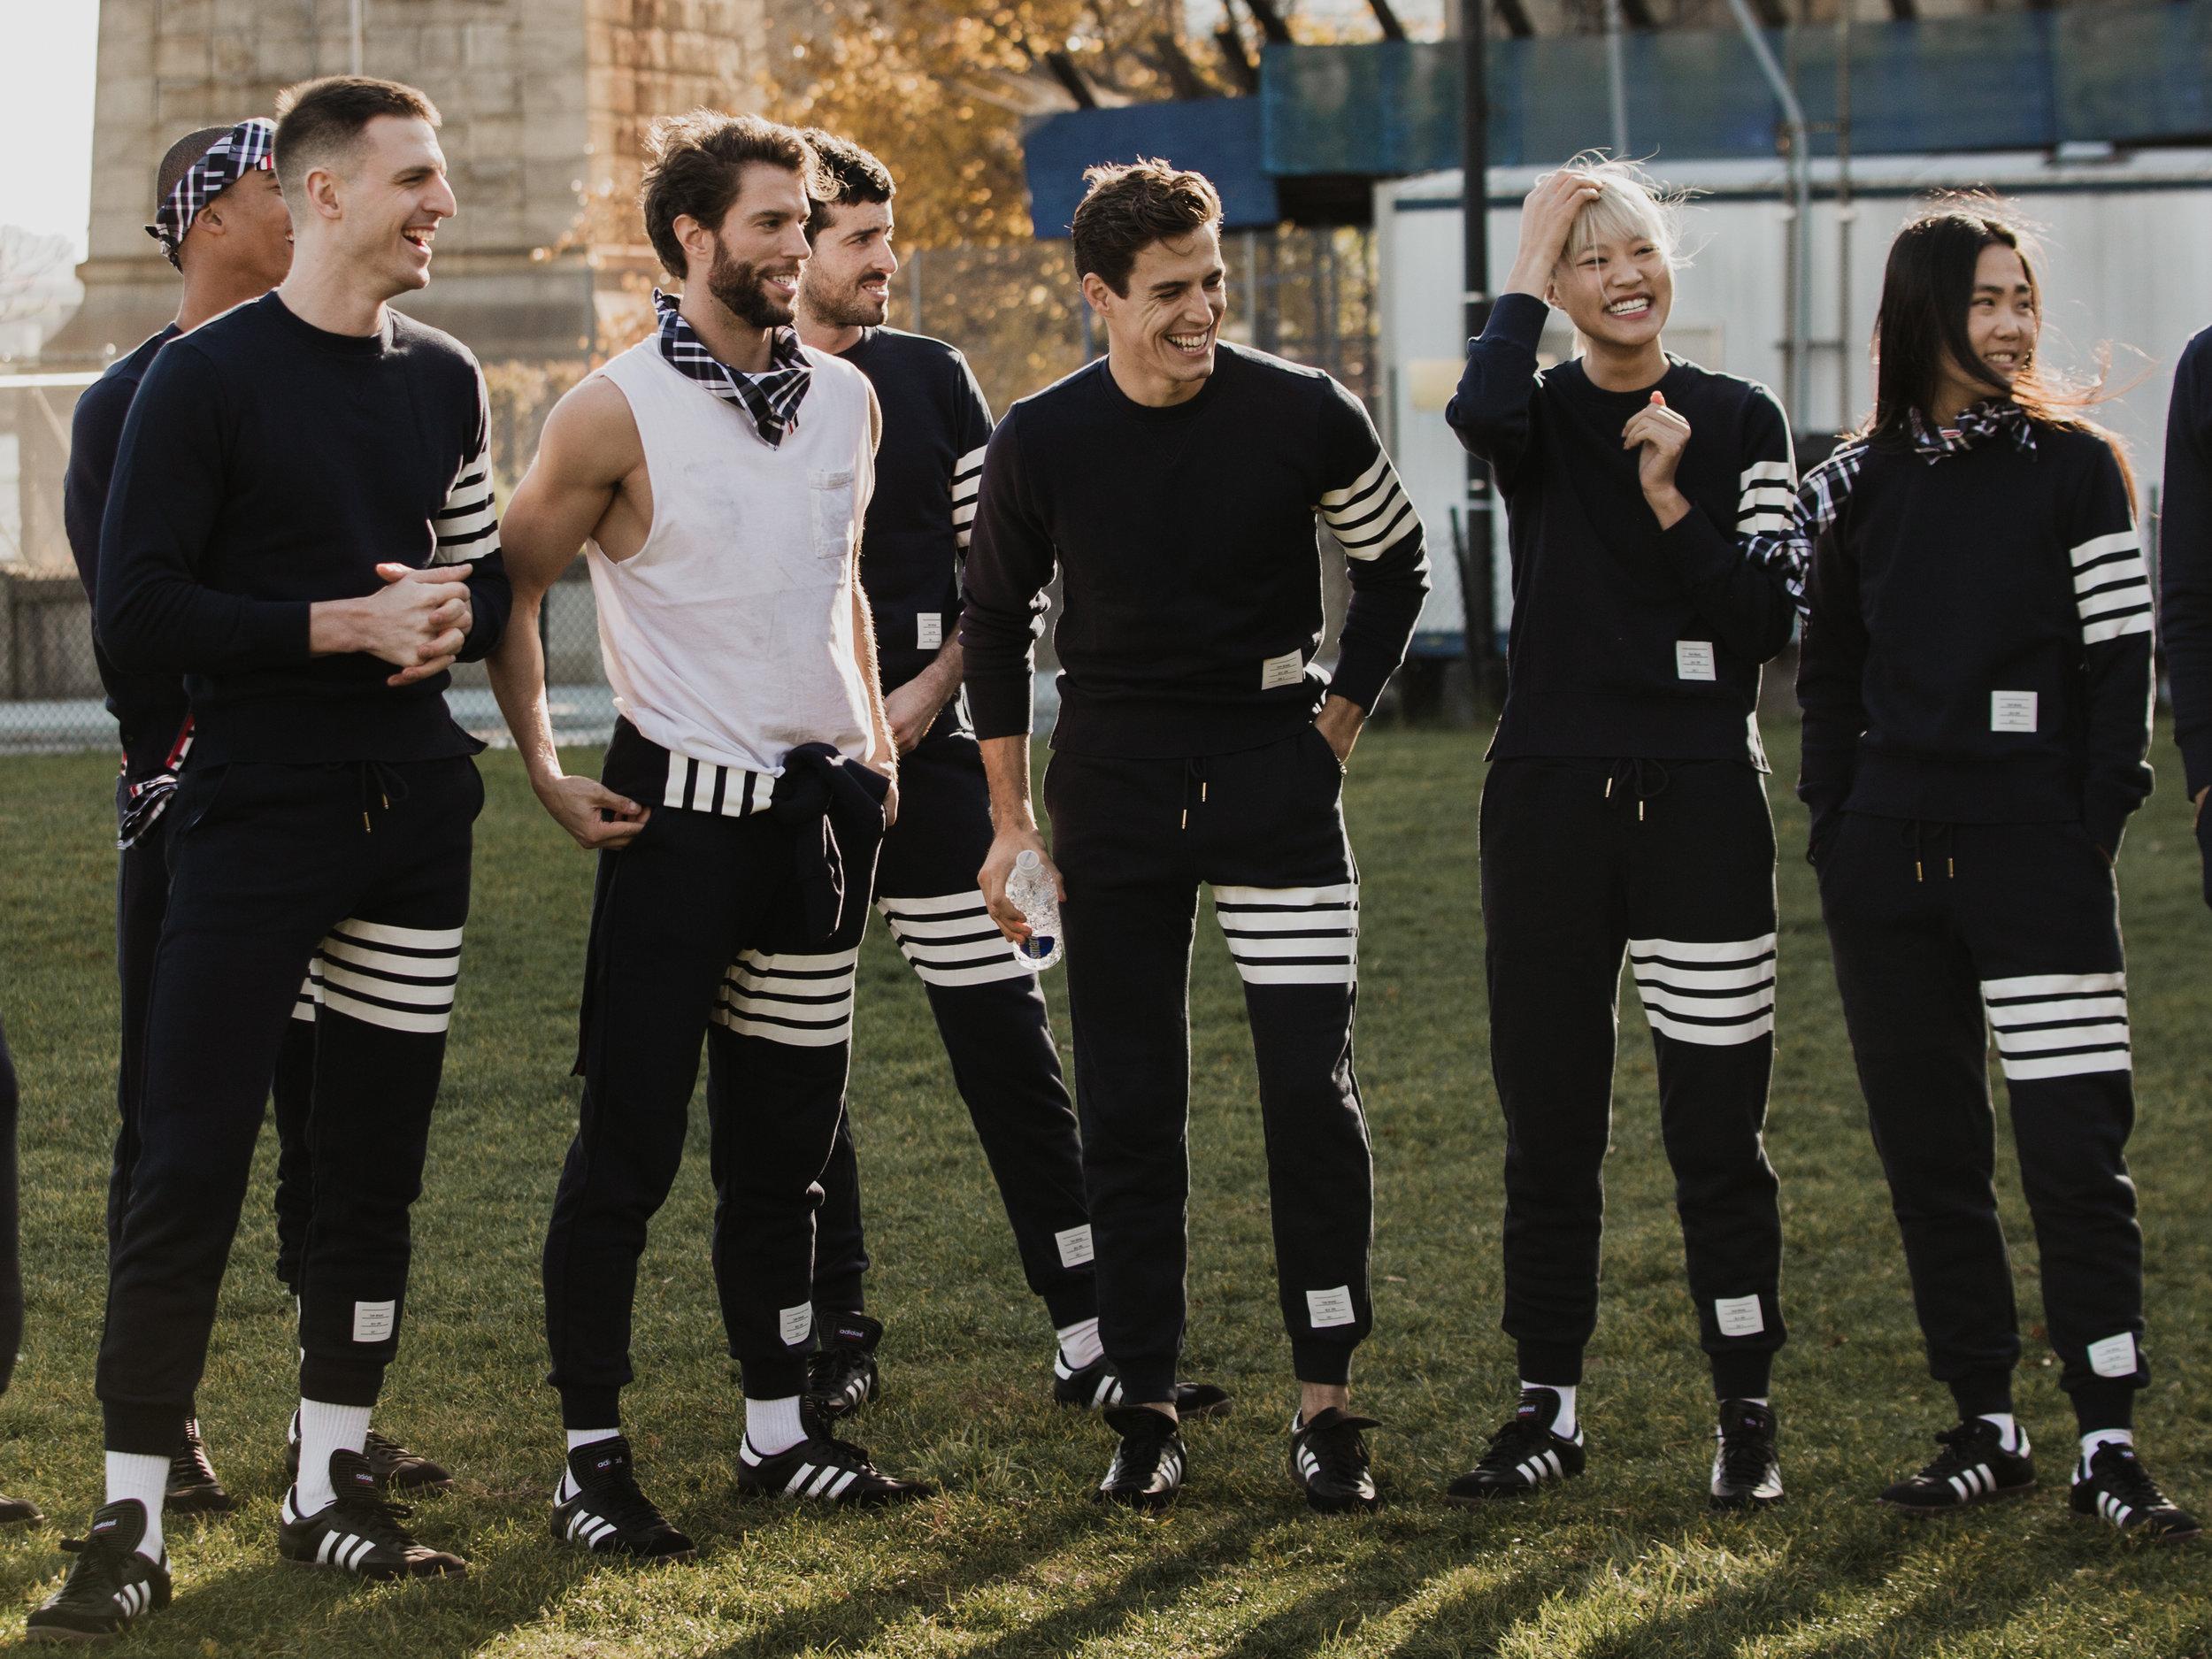 Thom Browne Football Game, 2016  Thom Browne / Vogue